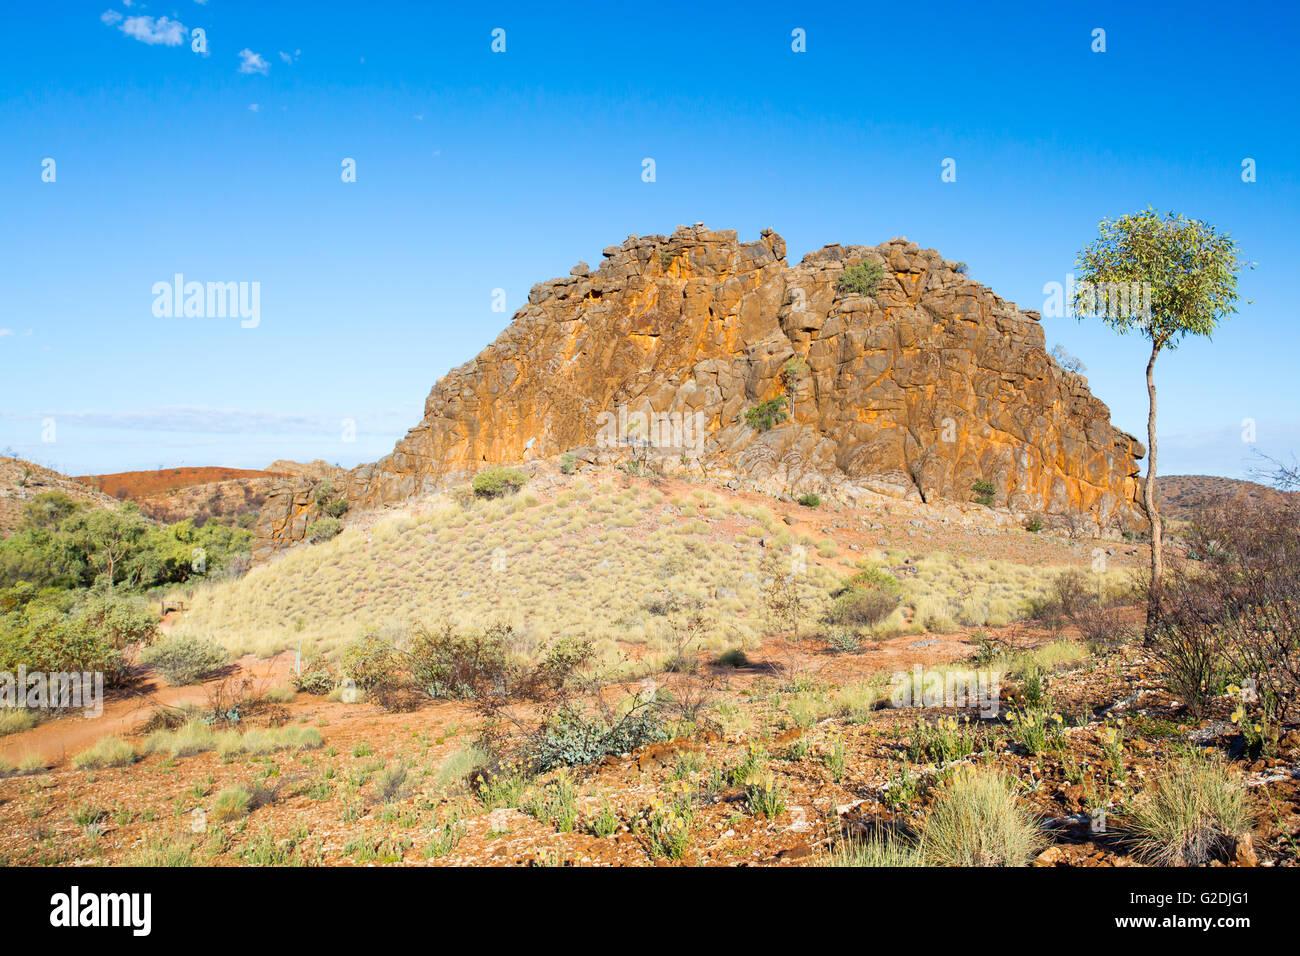 Corroboree Rock in East Macdonnell Ranges near Alice Springs, Northern Territory, Australia - Stock Image